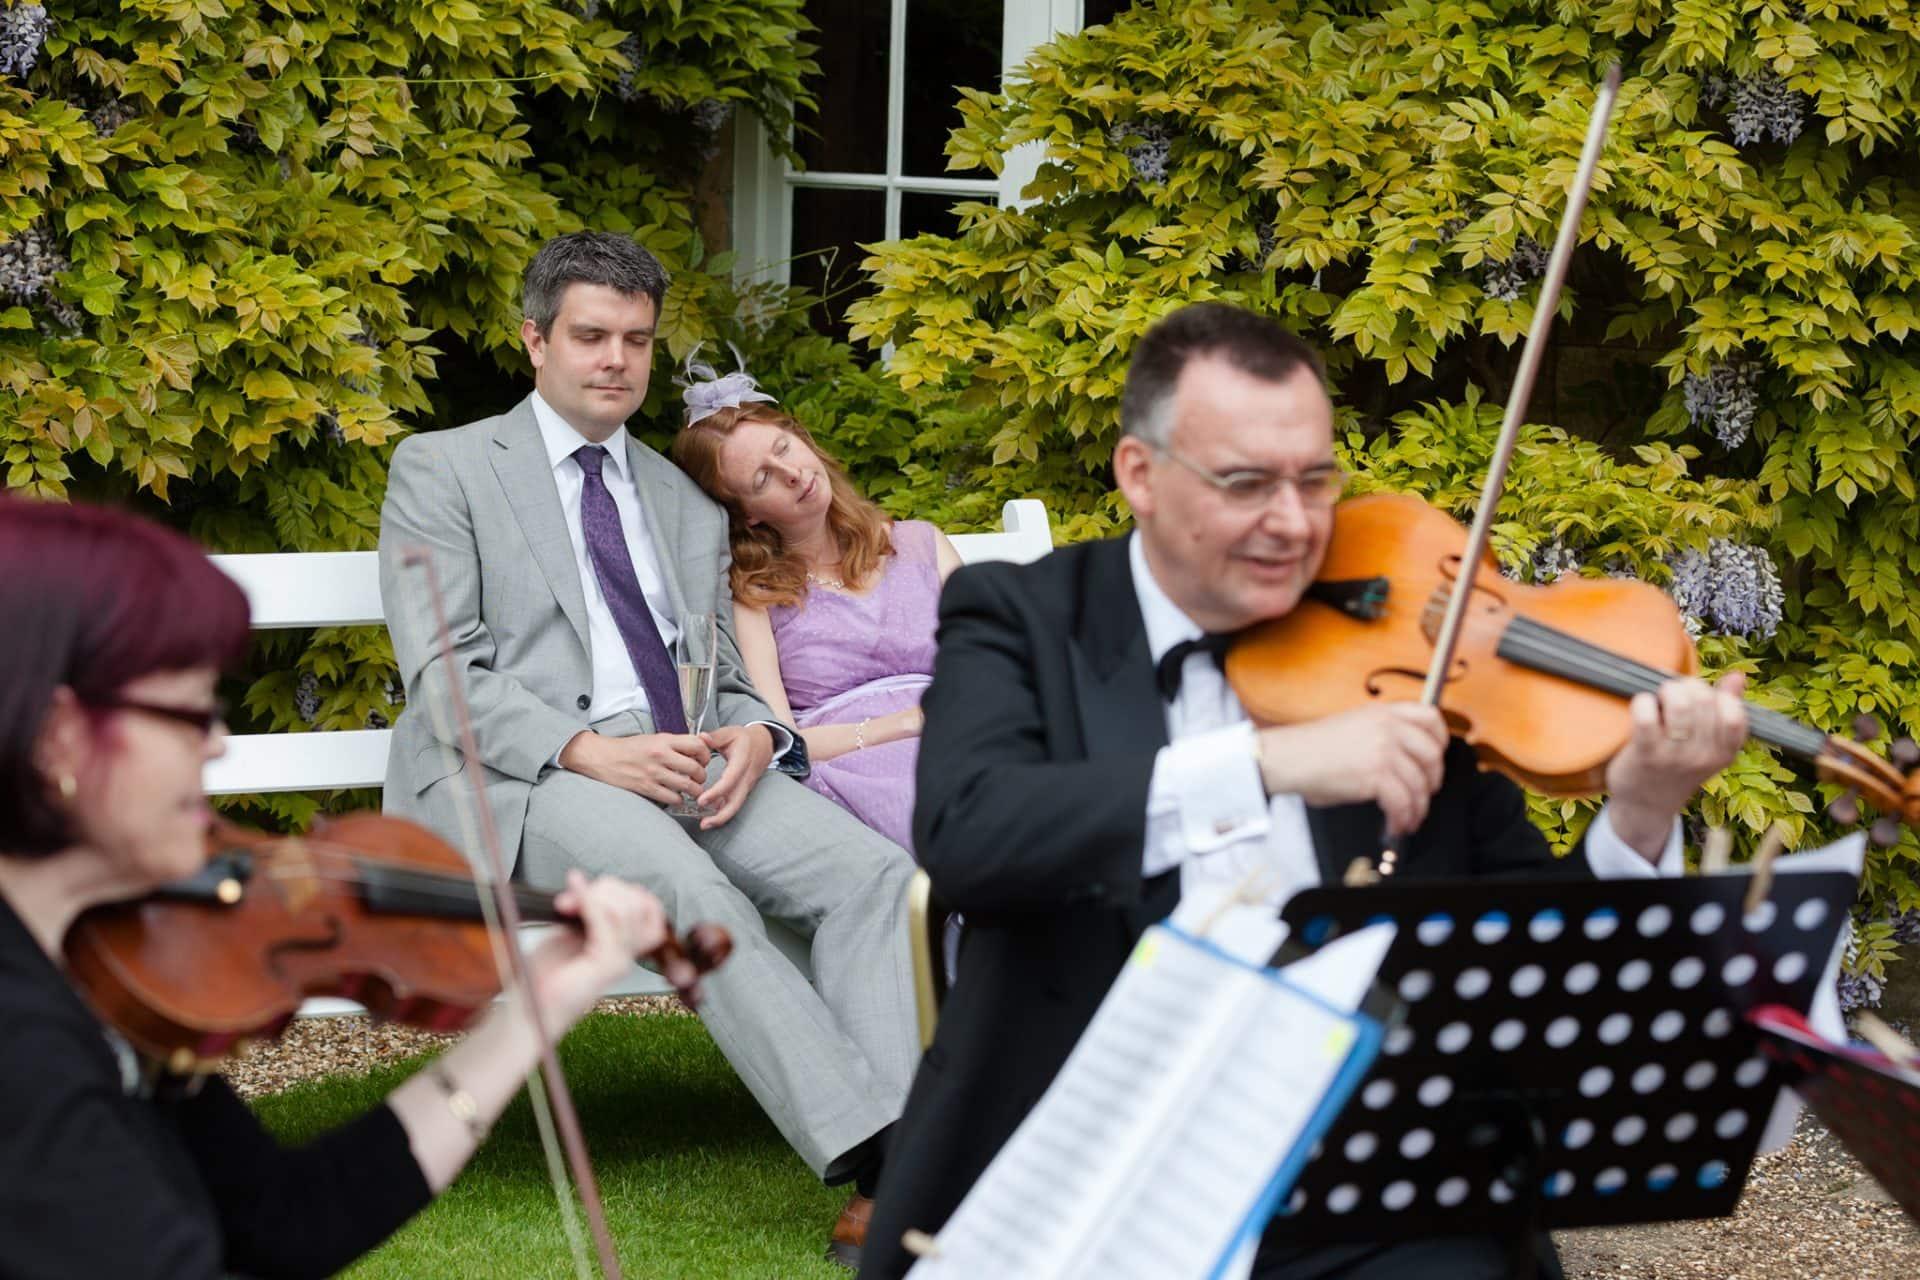 String quartet playing at a wedding